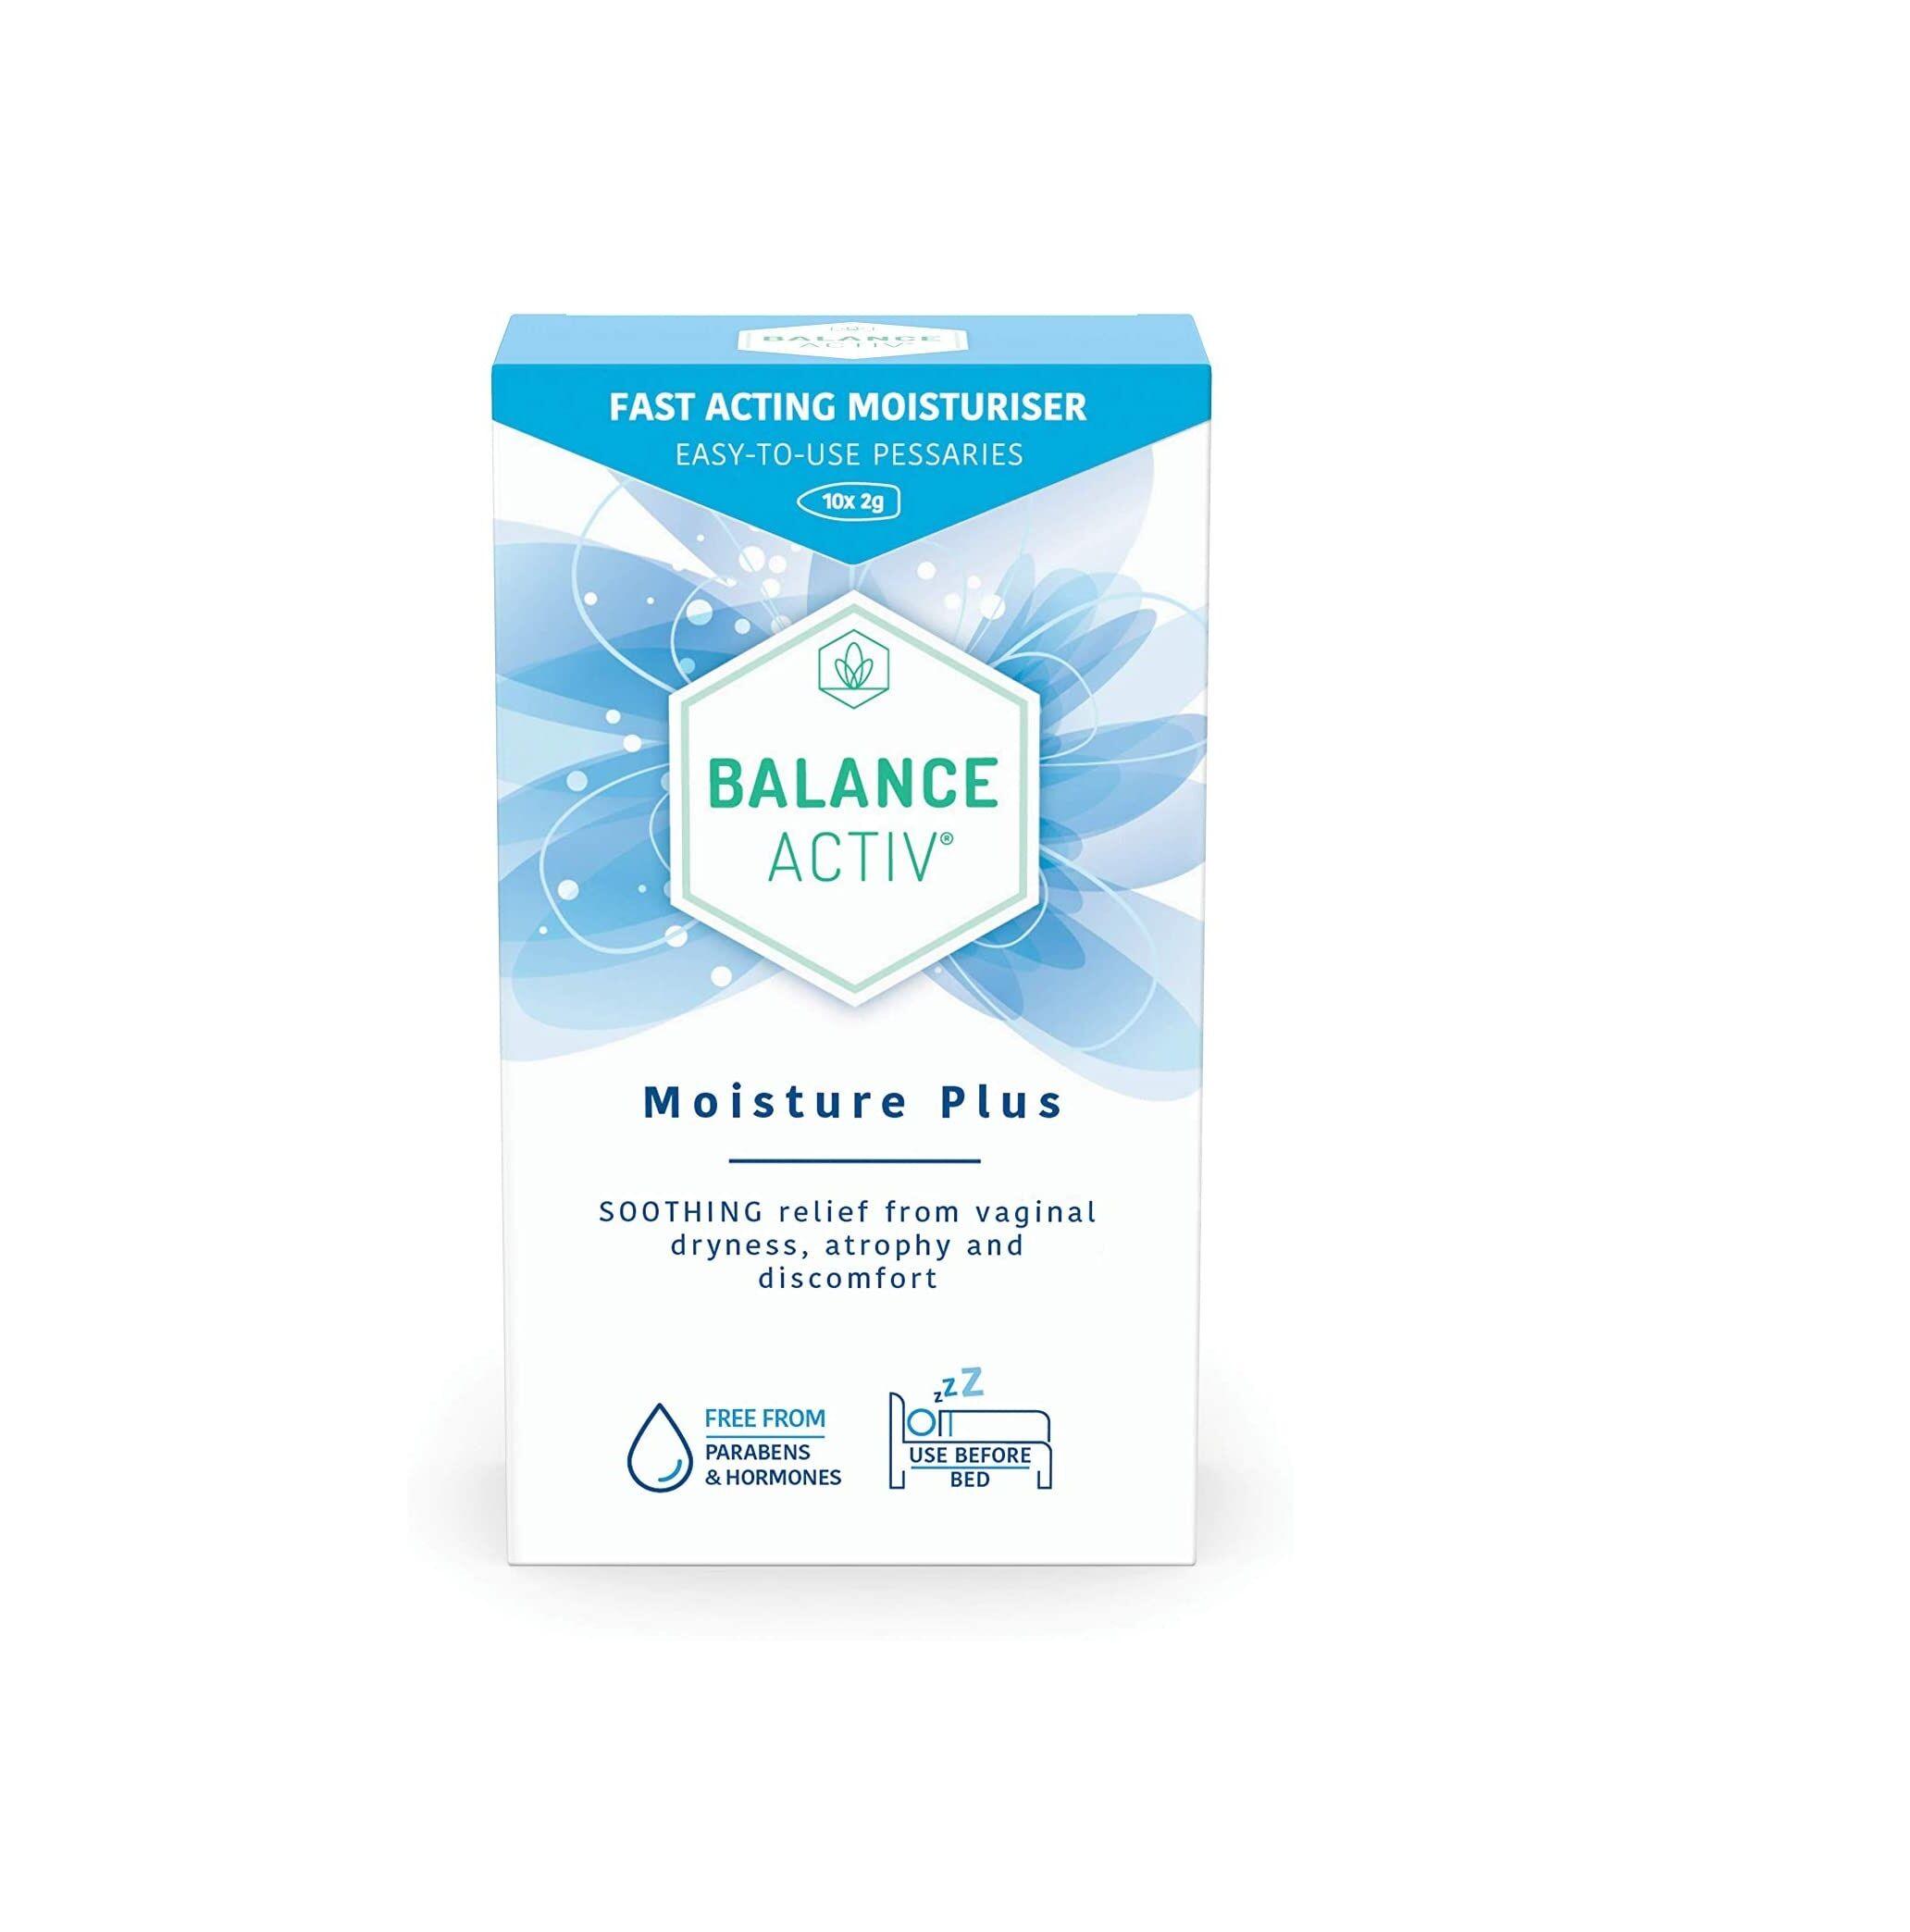 Balance Activ Moisture Gel Vaginal Dryness